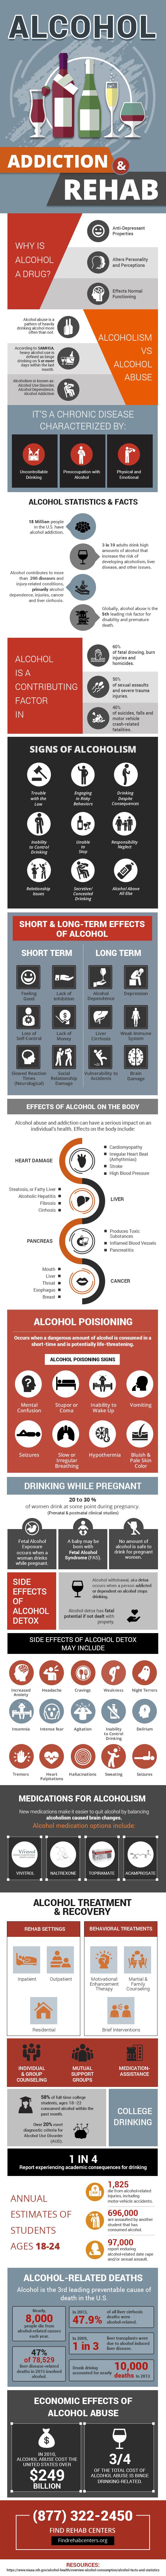 Alcohol Addiction & Rehab Infographic